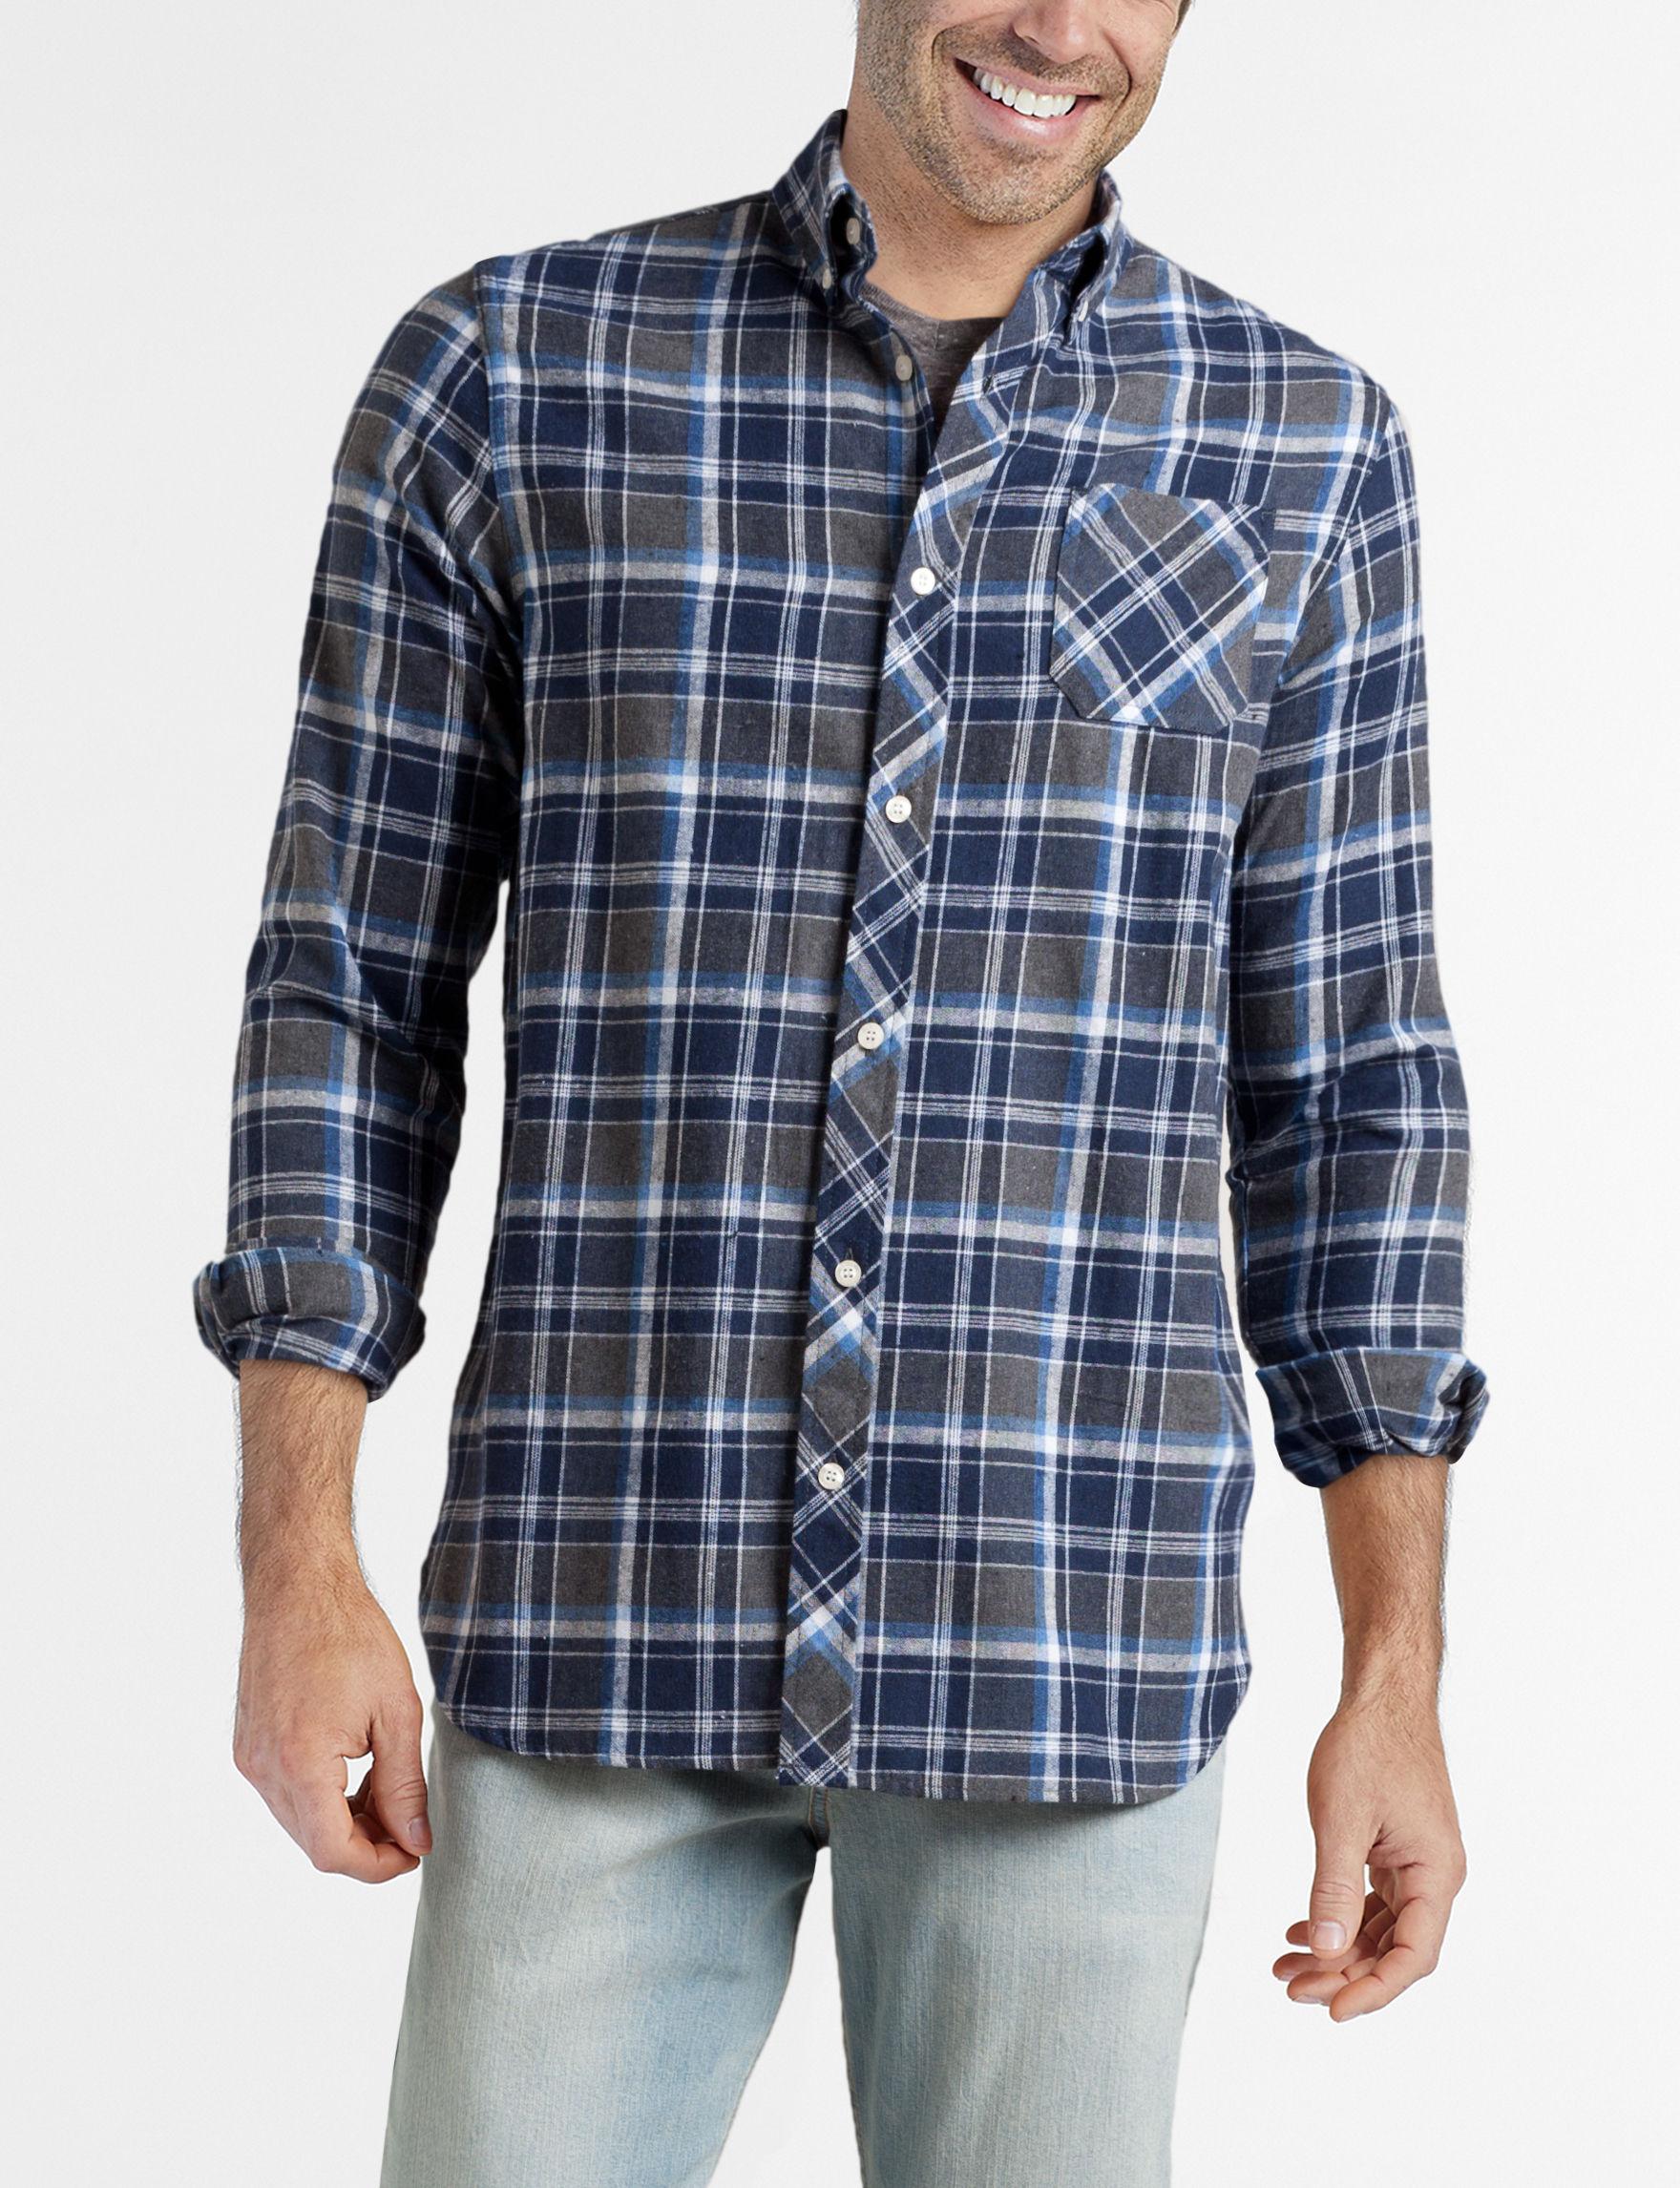 Brooklyn Standard Navy Plaid Casual Button Down Shirts